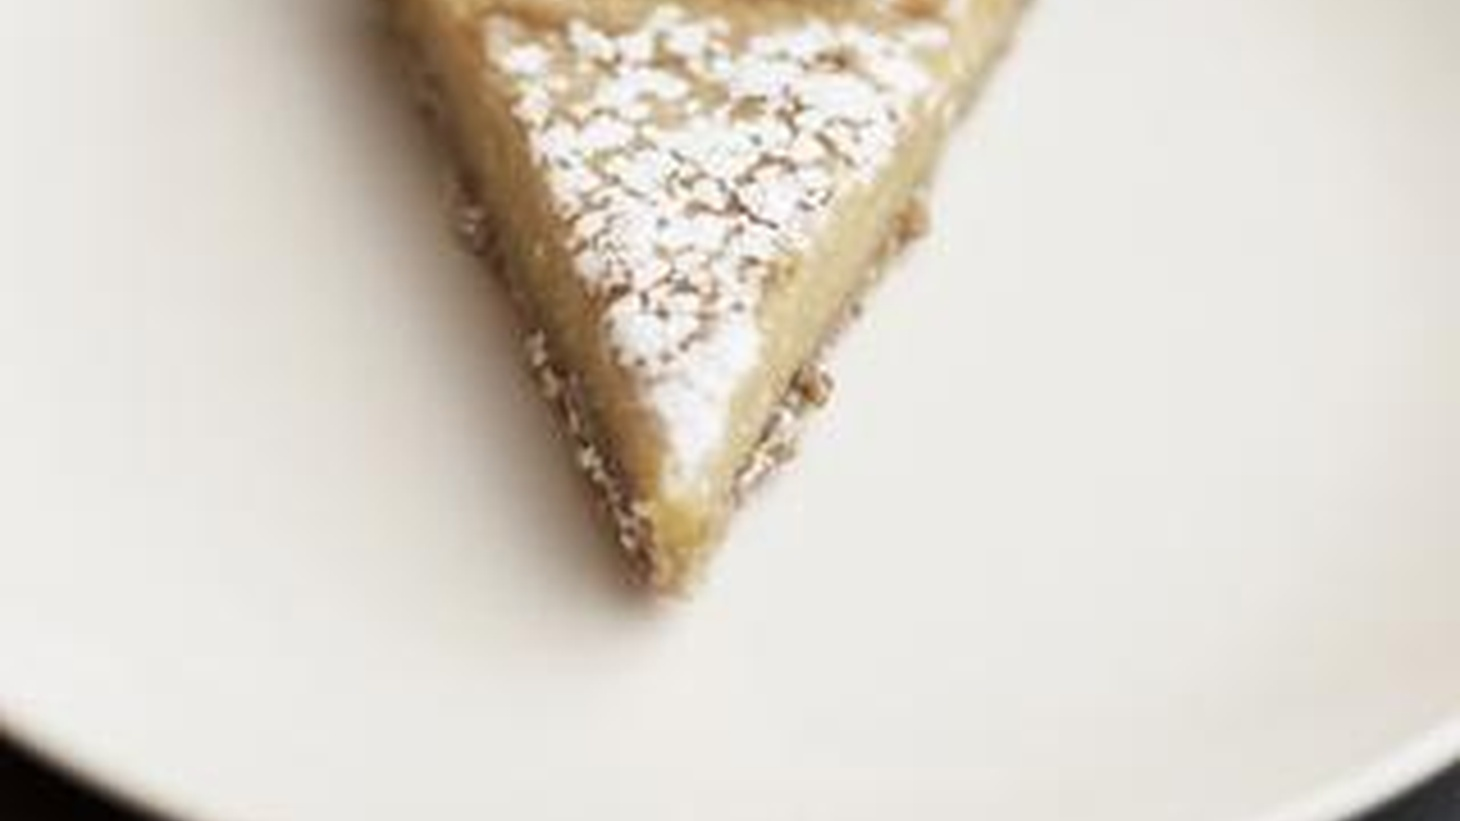 Christina Tosi of Momofuku and Milk Bar shares her recipe for Crack Pie.